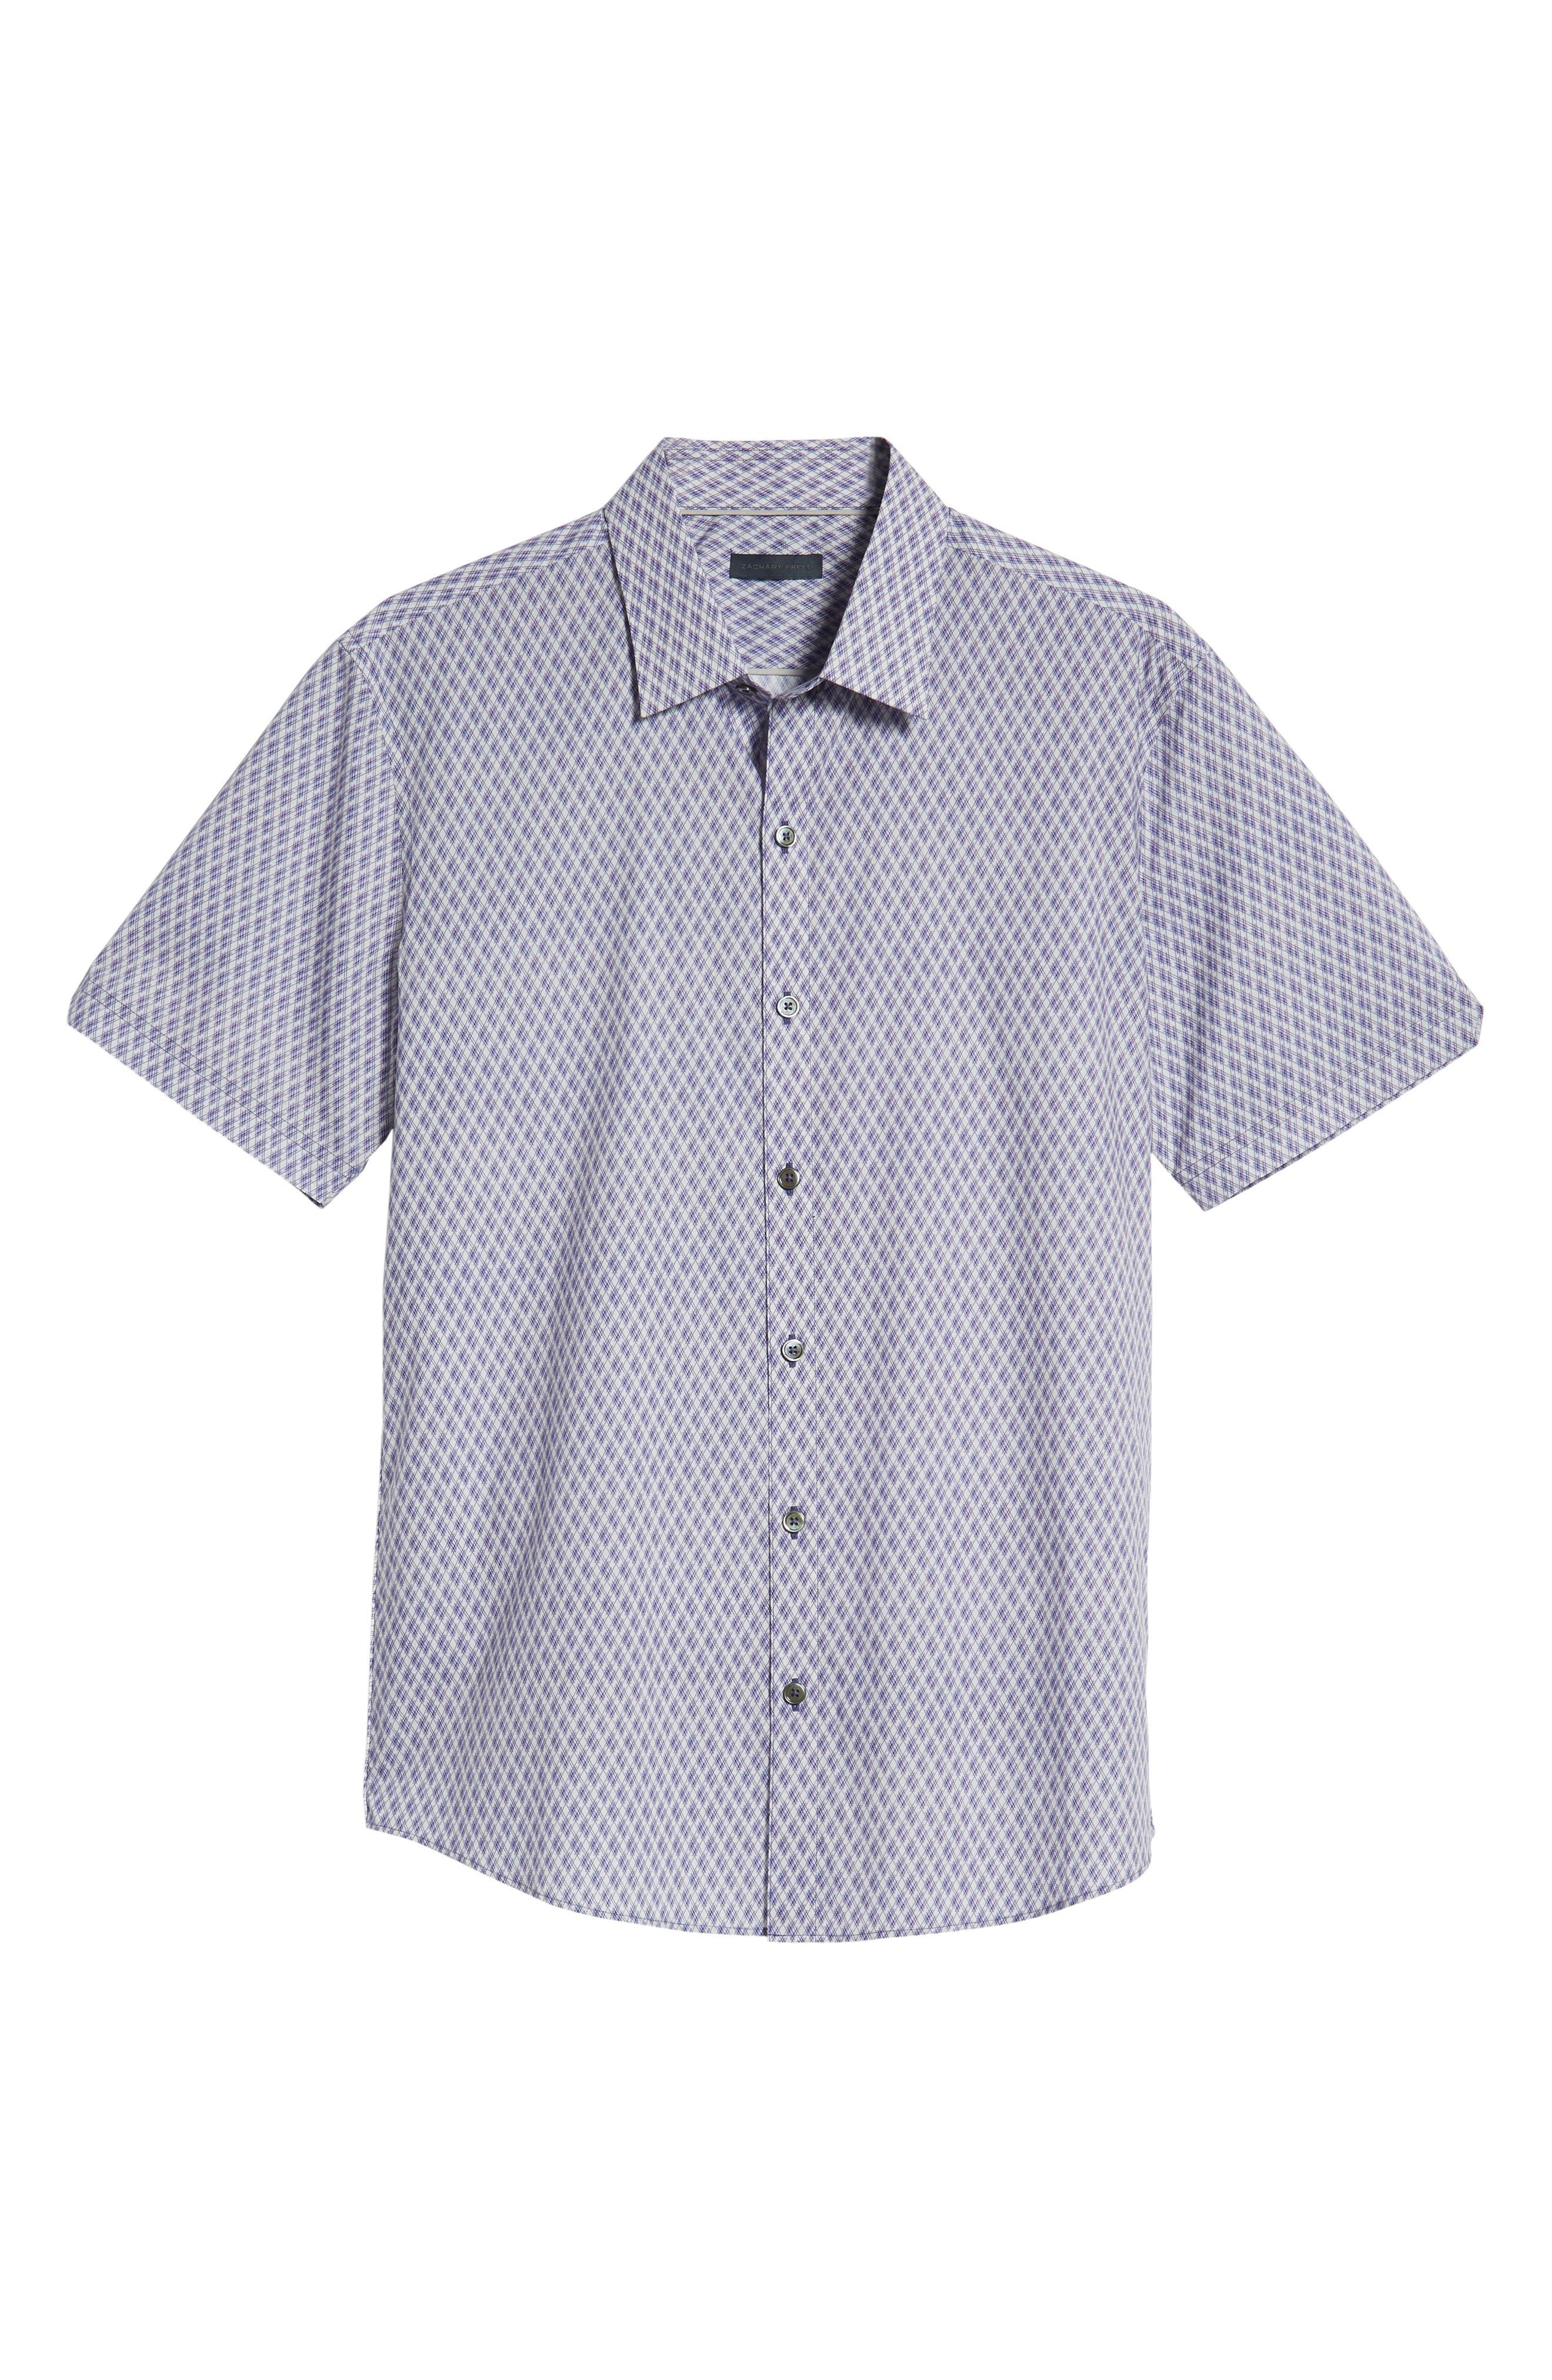 Madorin Regular Fit Sport Shirt,                             Alternate thumbnail 5, color,                             PURPLE